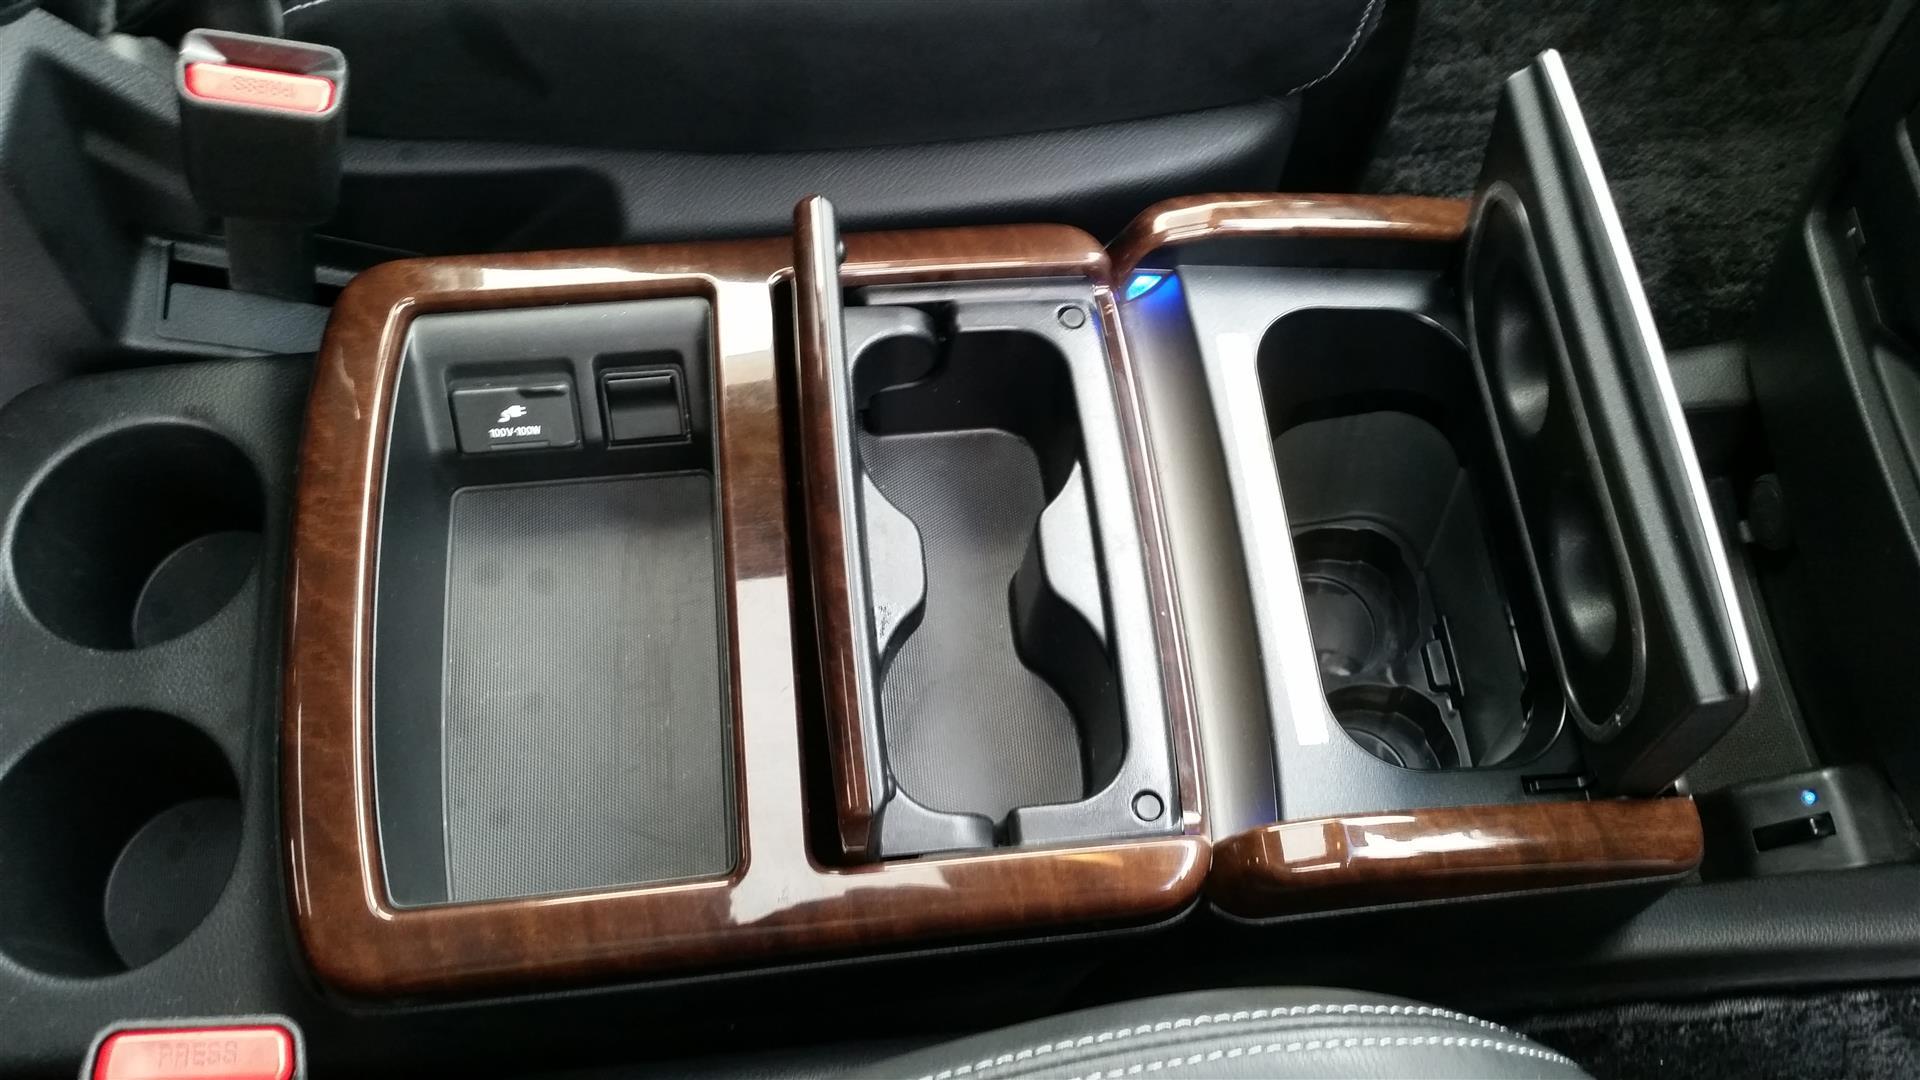 2012 Nissan Elgrand E52 20150627_143511 (Large)